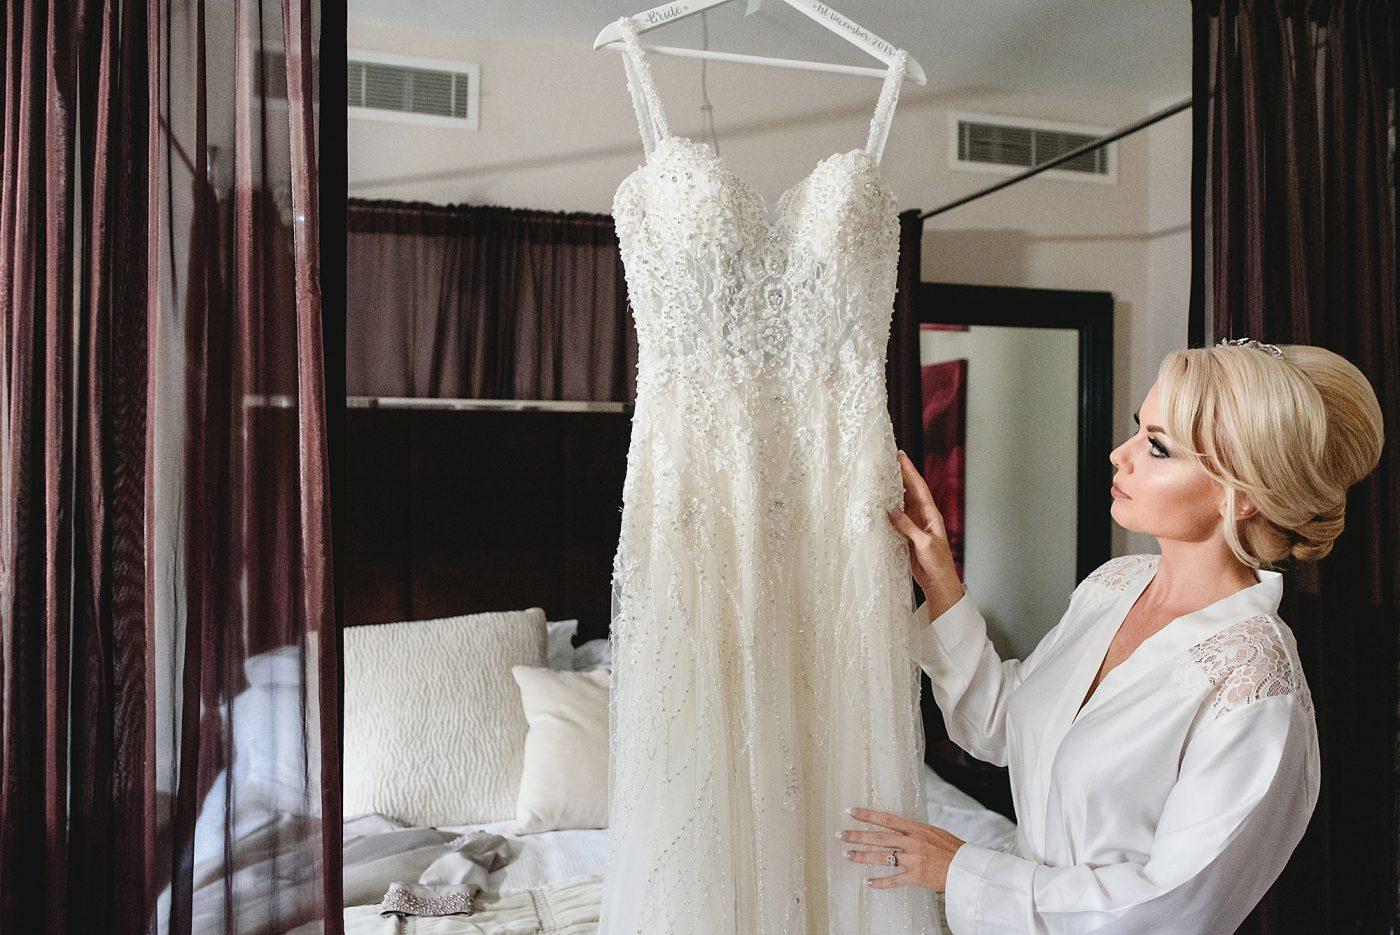 kenneth winston dress hanging up